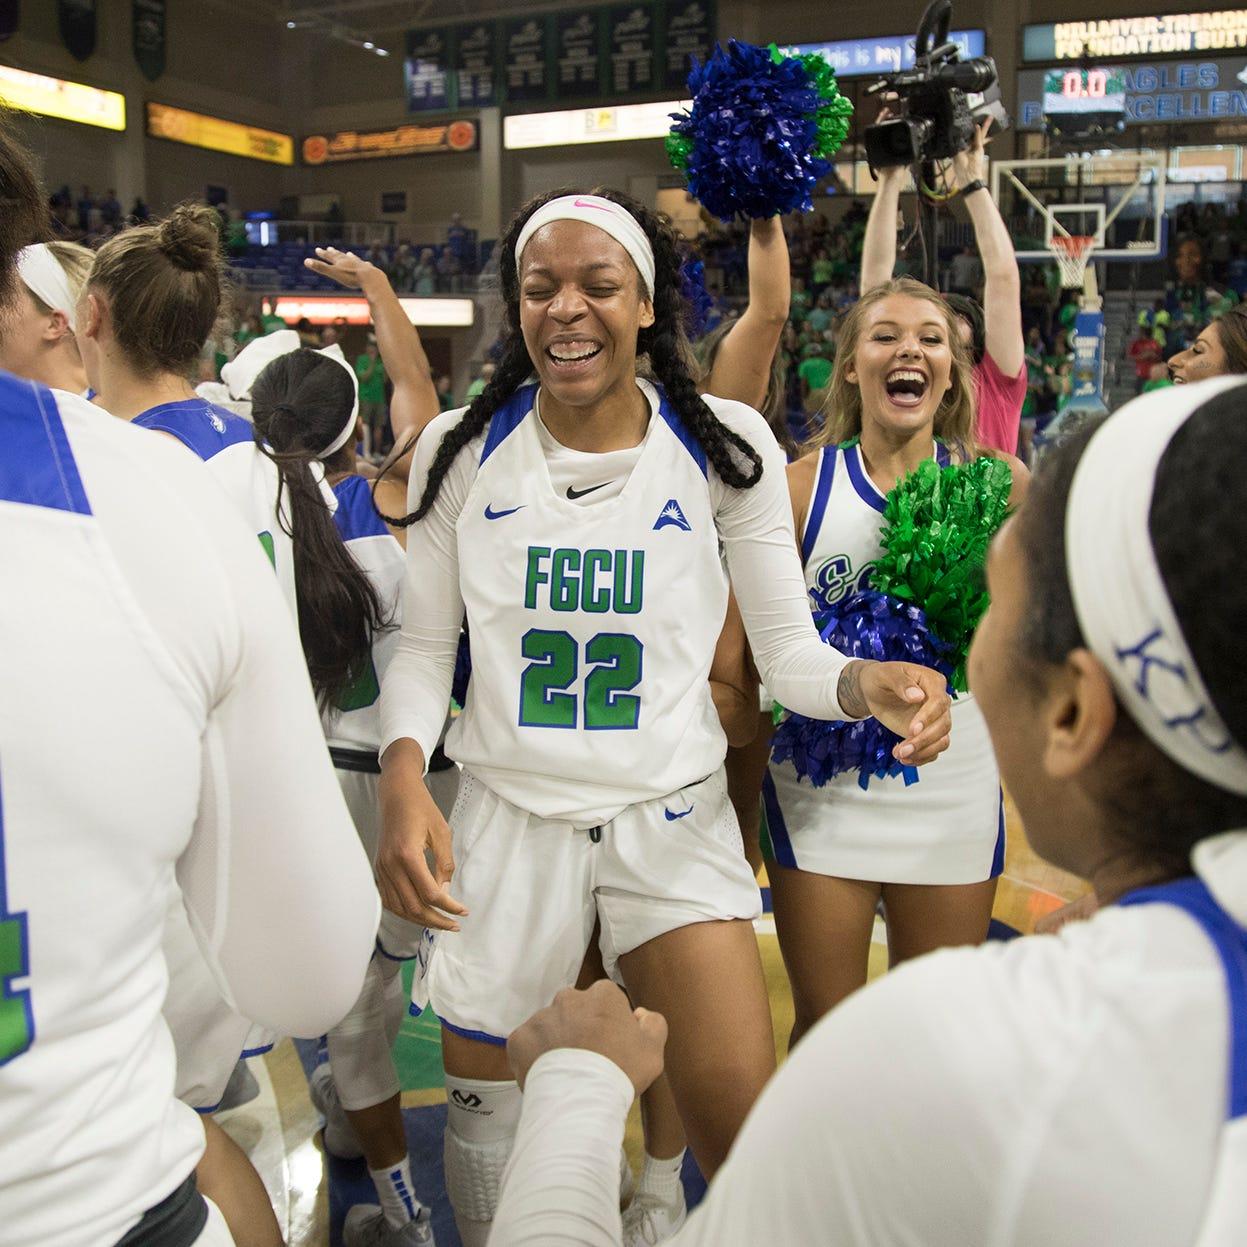 College basketball: FGCU women win ASUN title to earn trip to NCAA tournament